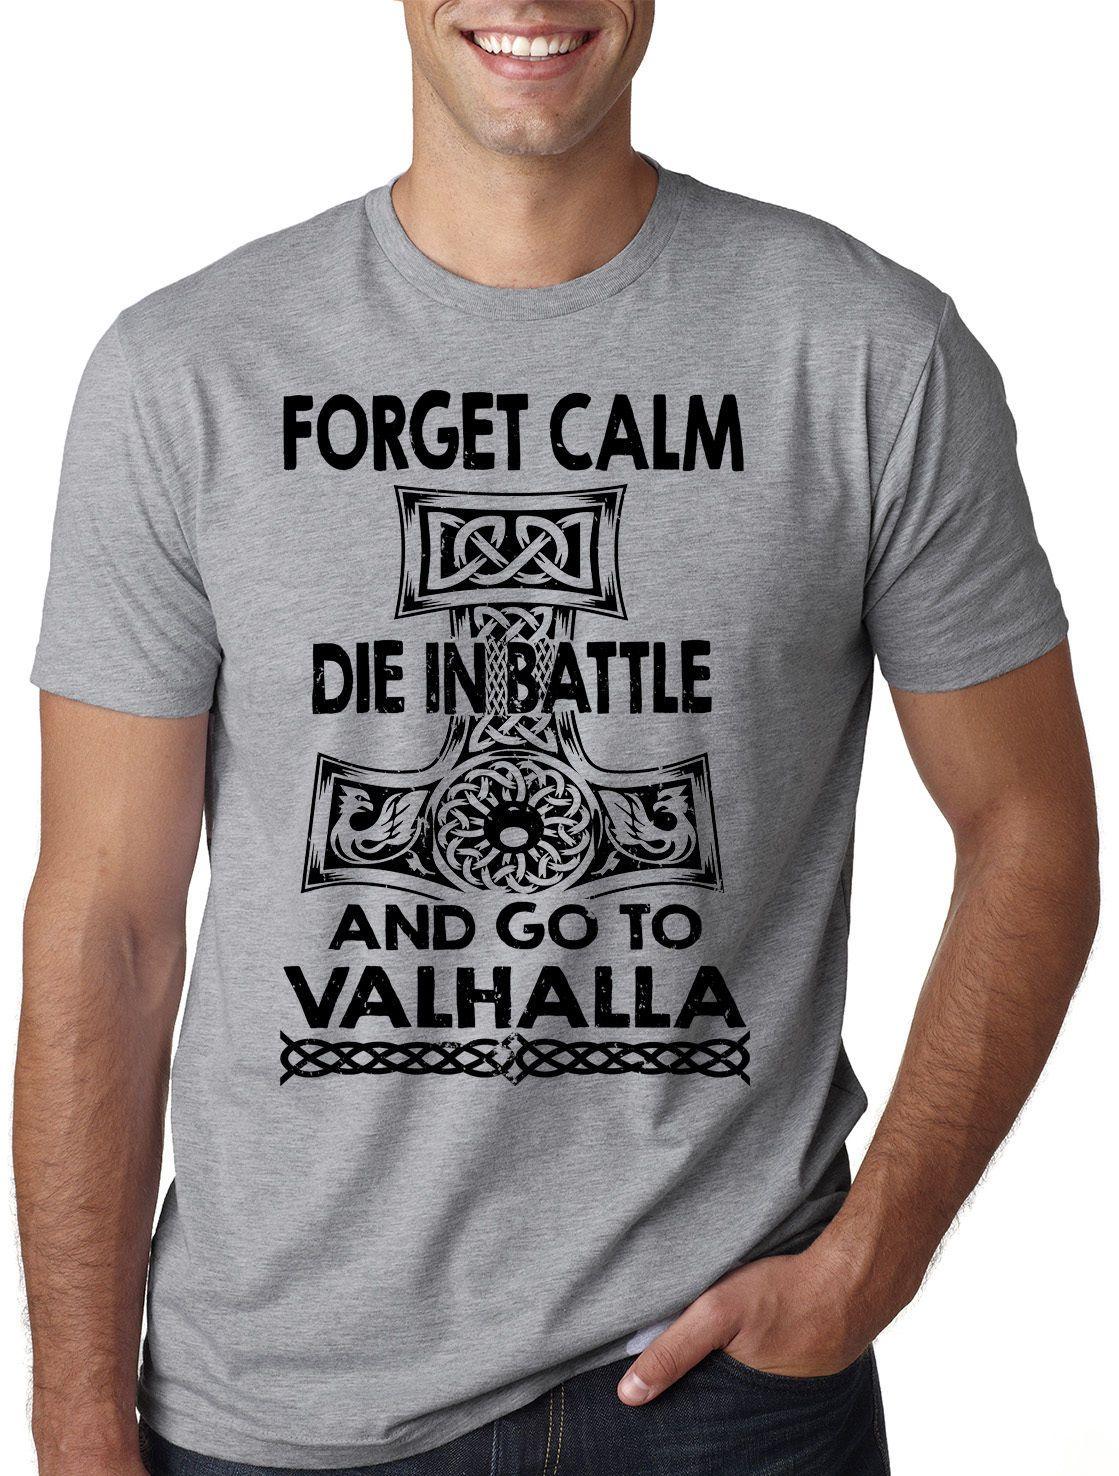 0058c54eab Viking T-Shirt Valhalla Funny Vikings Tee Shirt T-Shirt For Men Premium  Custom Short Sleeve Boyfriend's Plus Size Group Tshirts